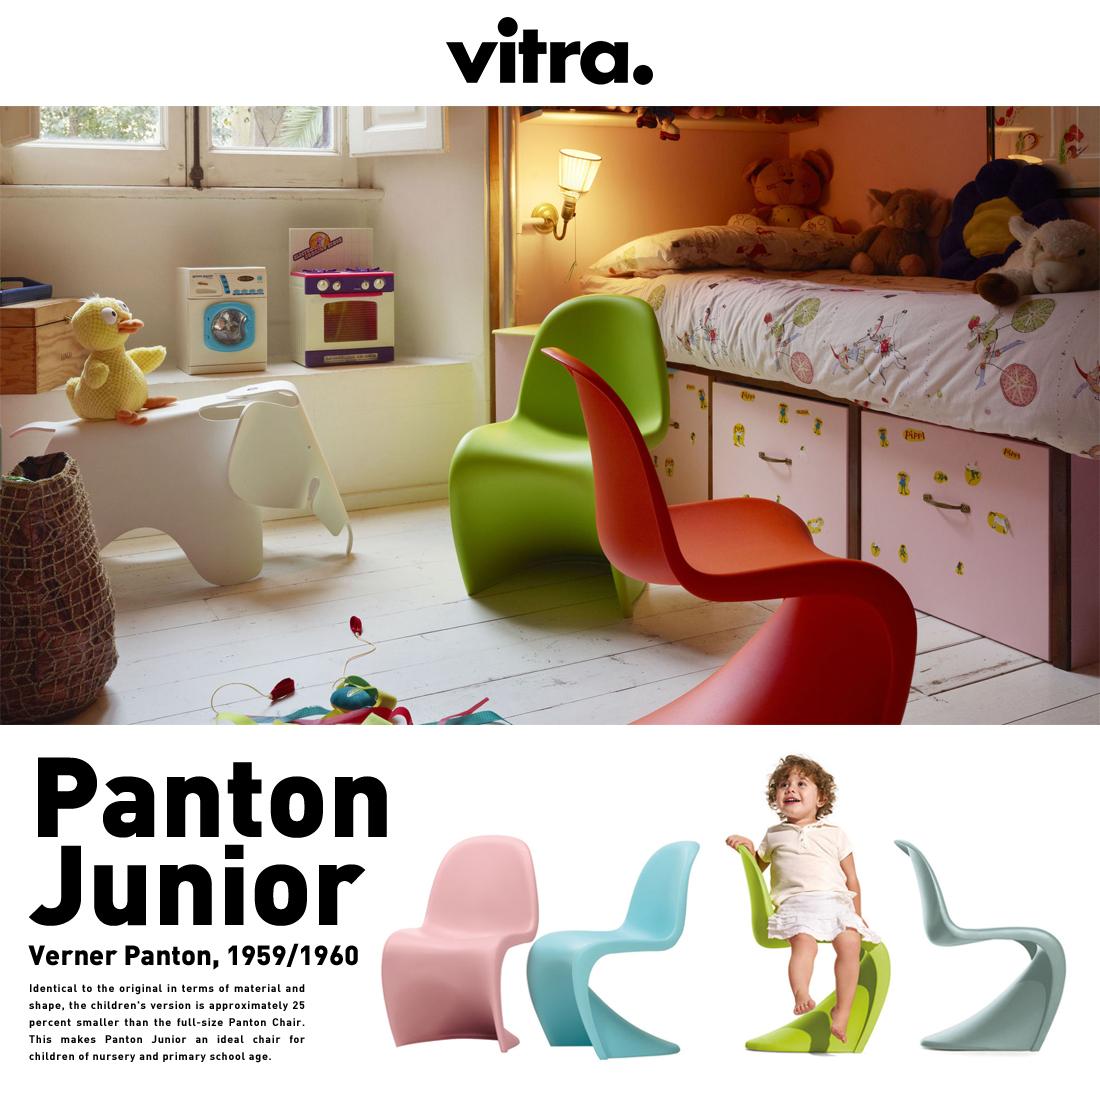 【Vitra】Panton Juniorr パントンジュニアヴィトラ ヴェルナー・パントン Verner Panton 椅子 子供用 デンマーク パントンチェア